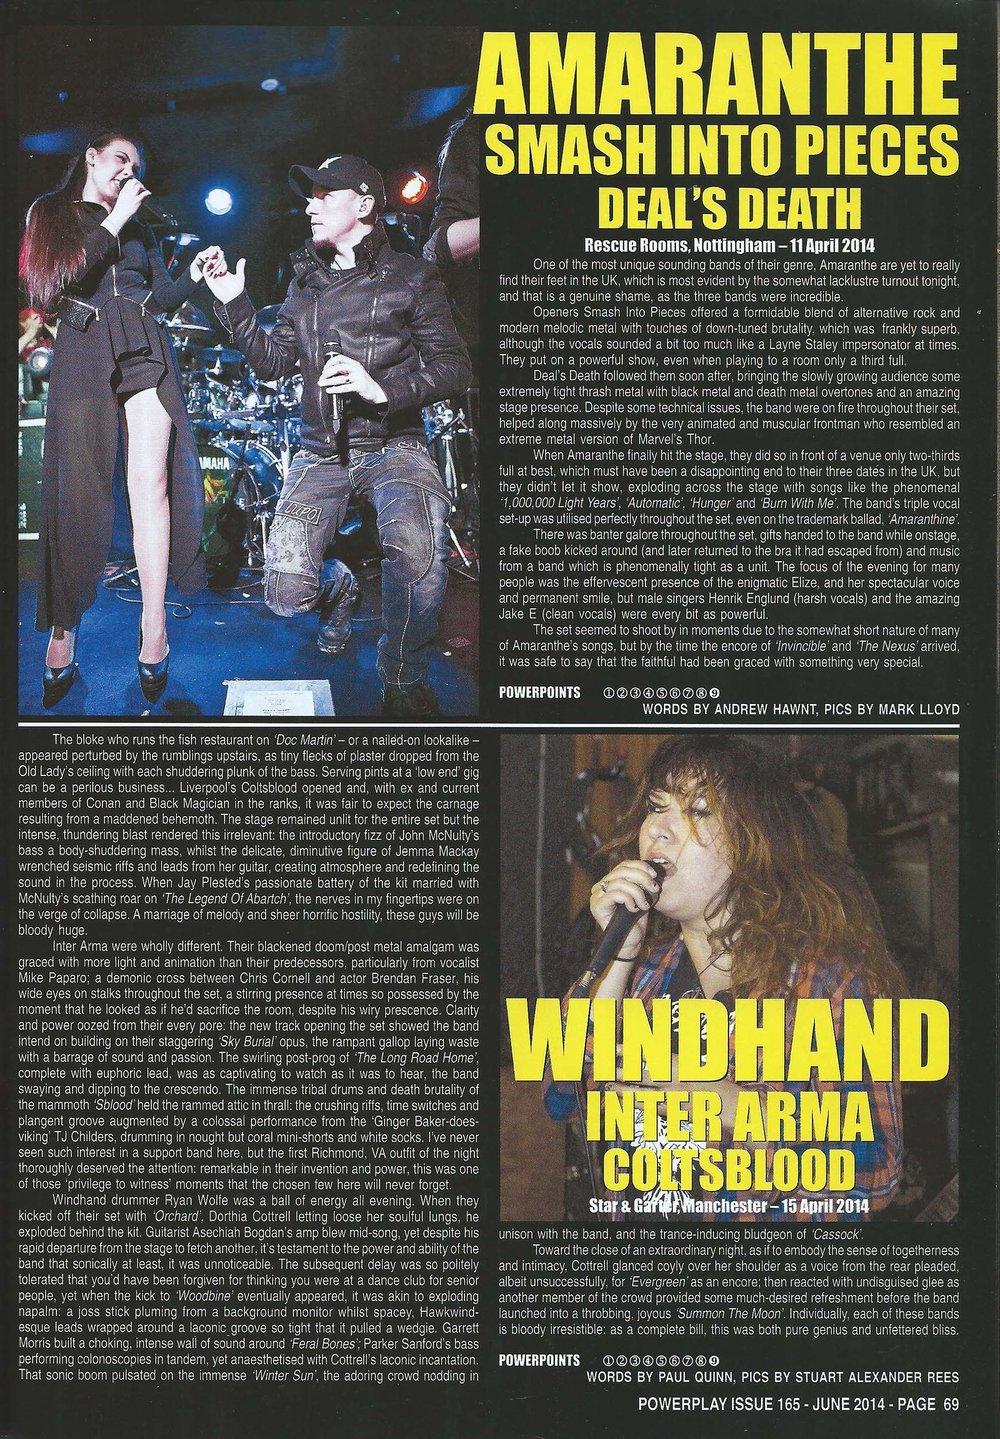 PowerPlay Magazine - Amaranthe Photos